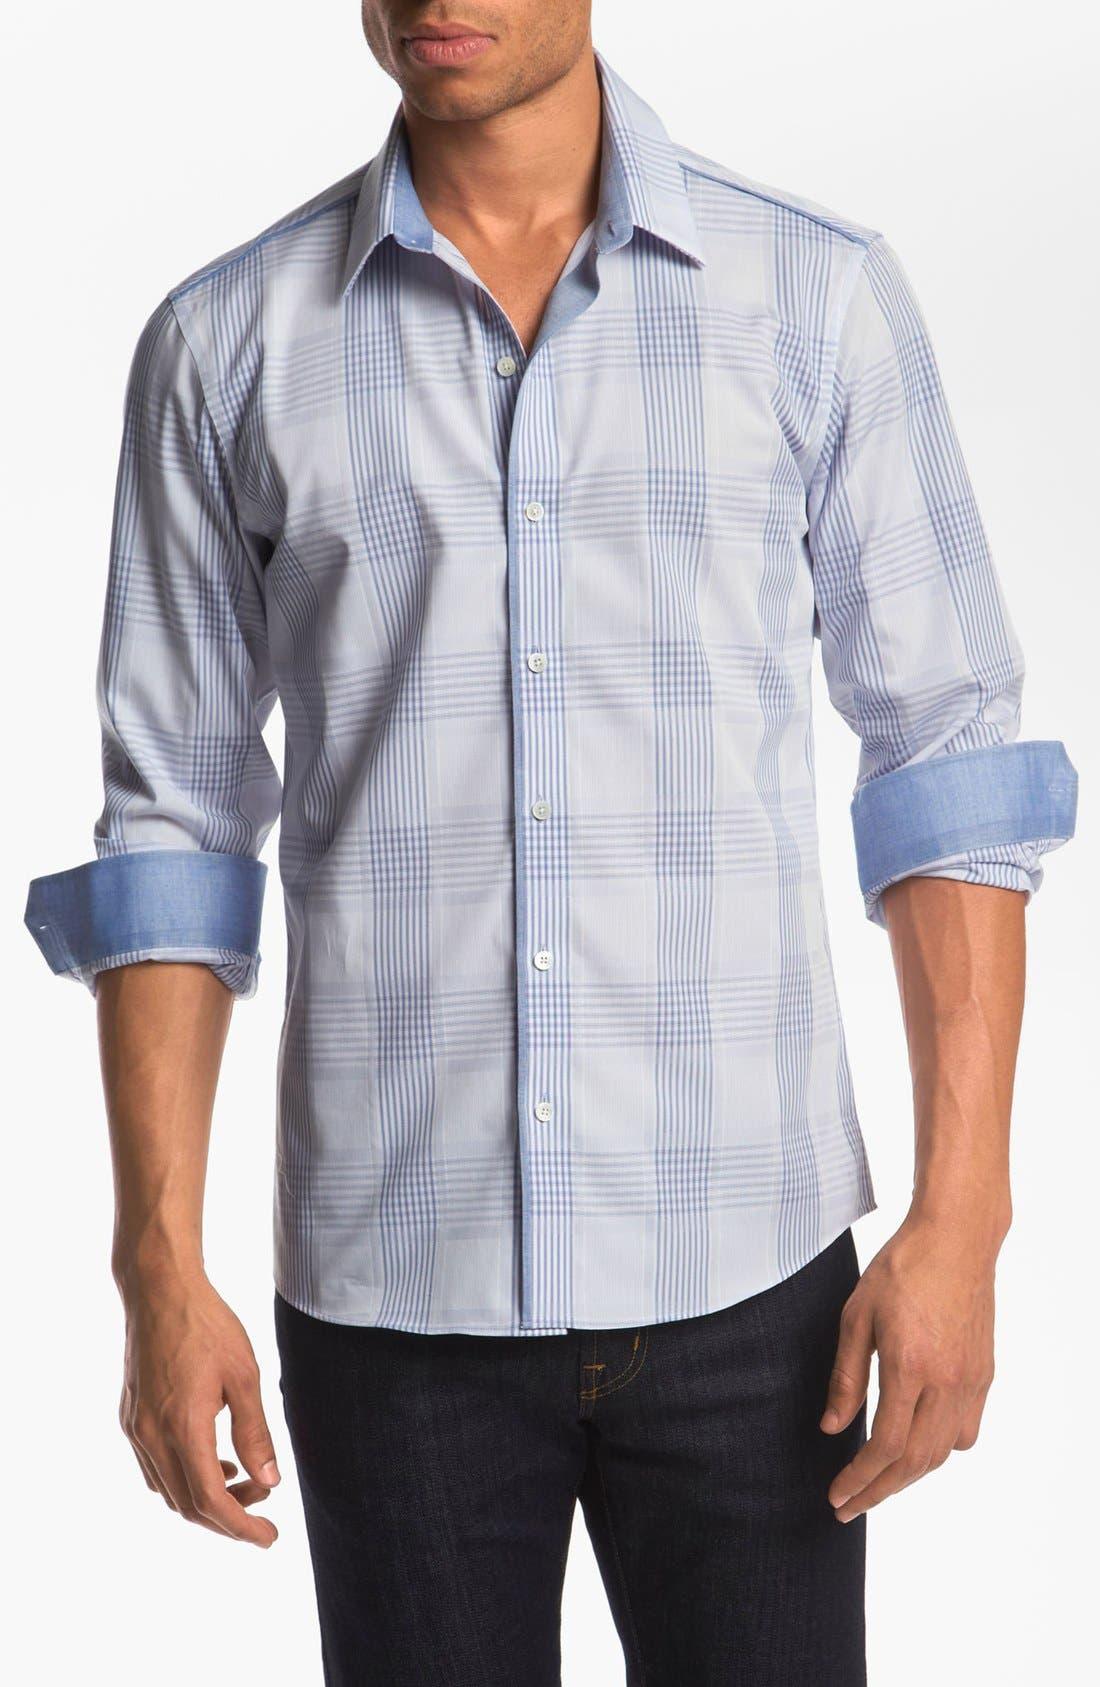 Alternate Image 1 Selected - Kenson Trim Fit Sport Shirt